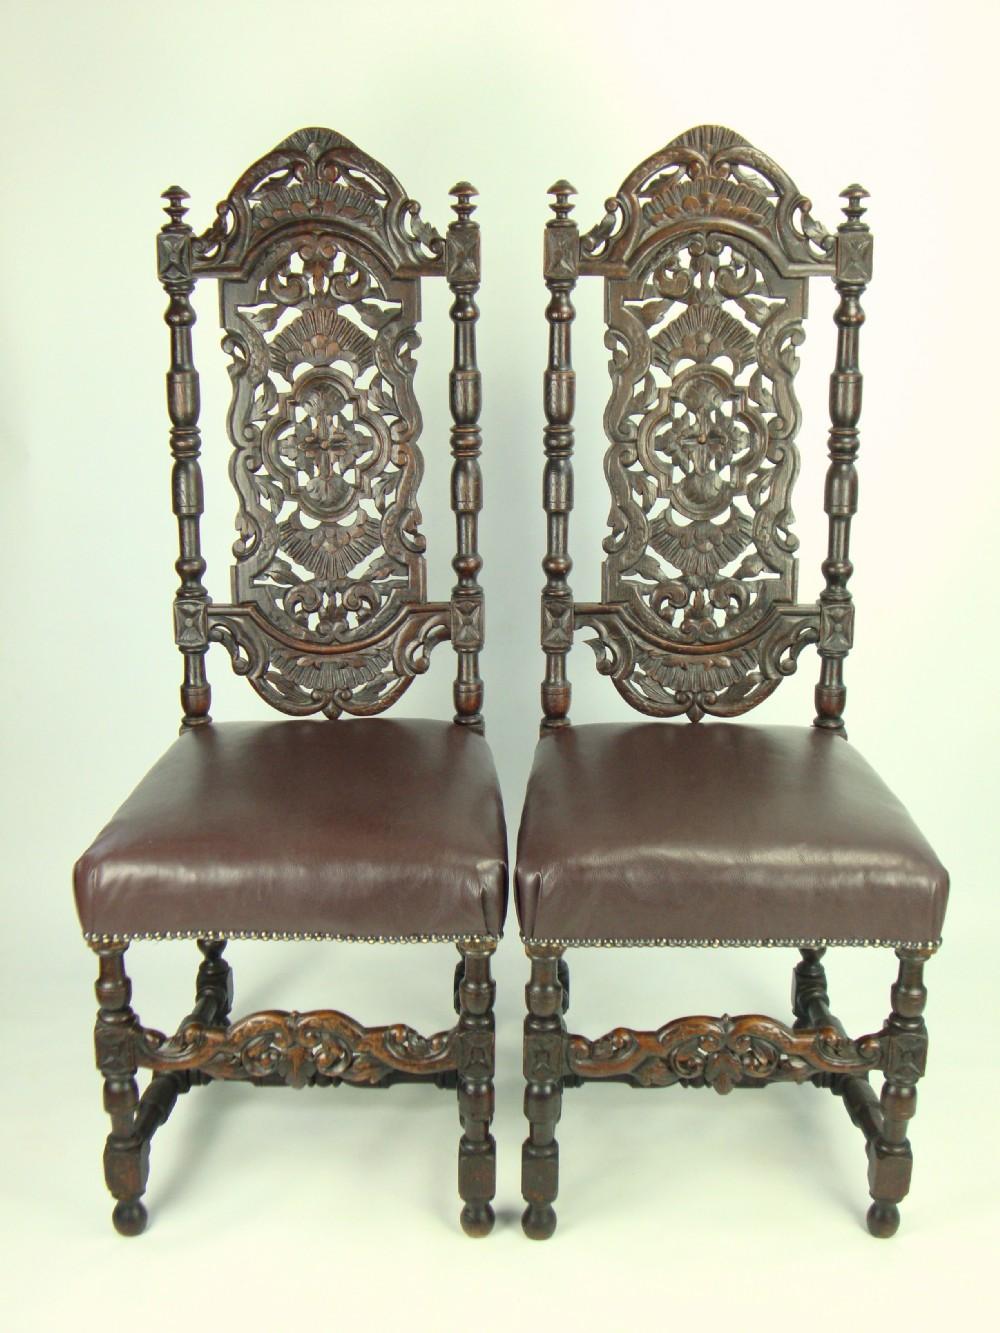 pair antique victorian gothic high back oak chairs - Pair Antique Victorian Gothic High Back Oak Chairs 252545